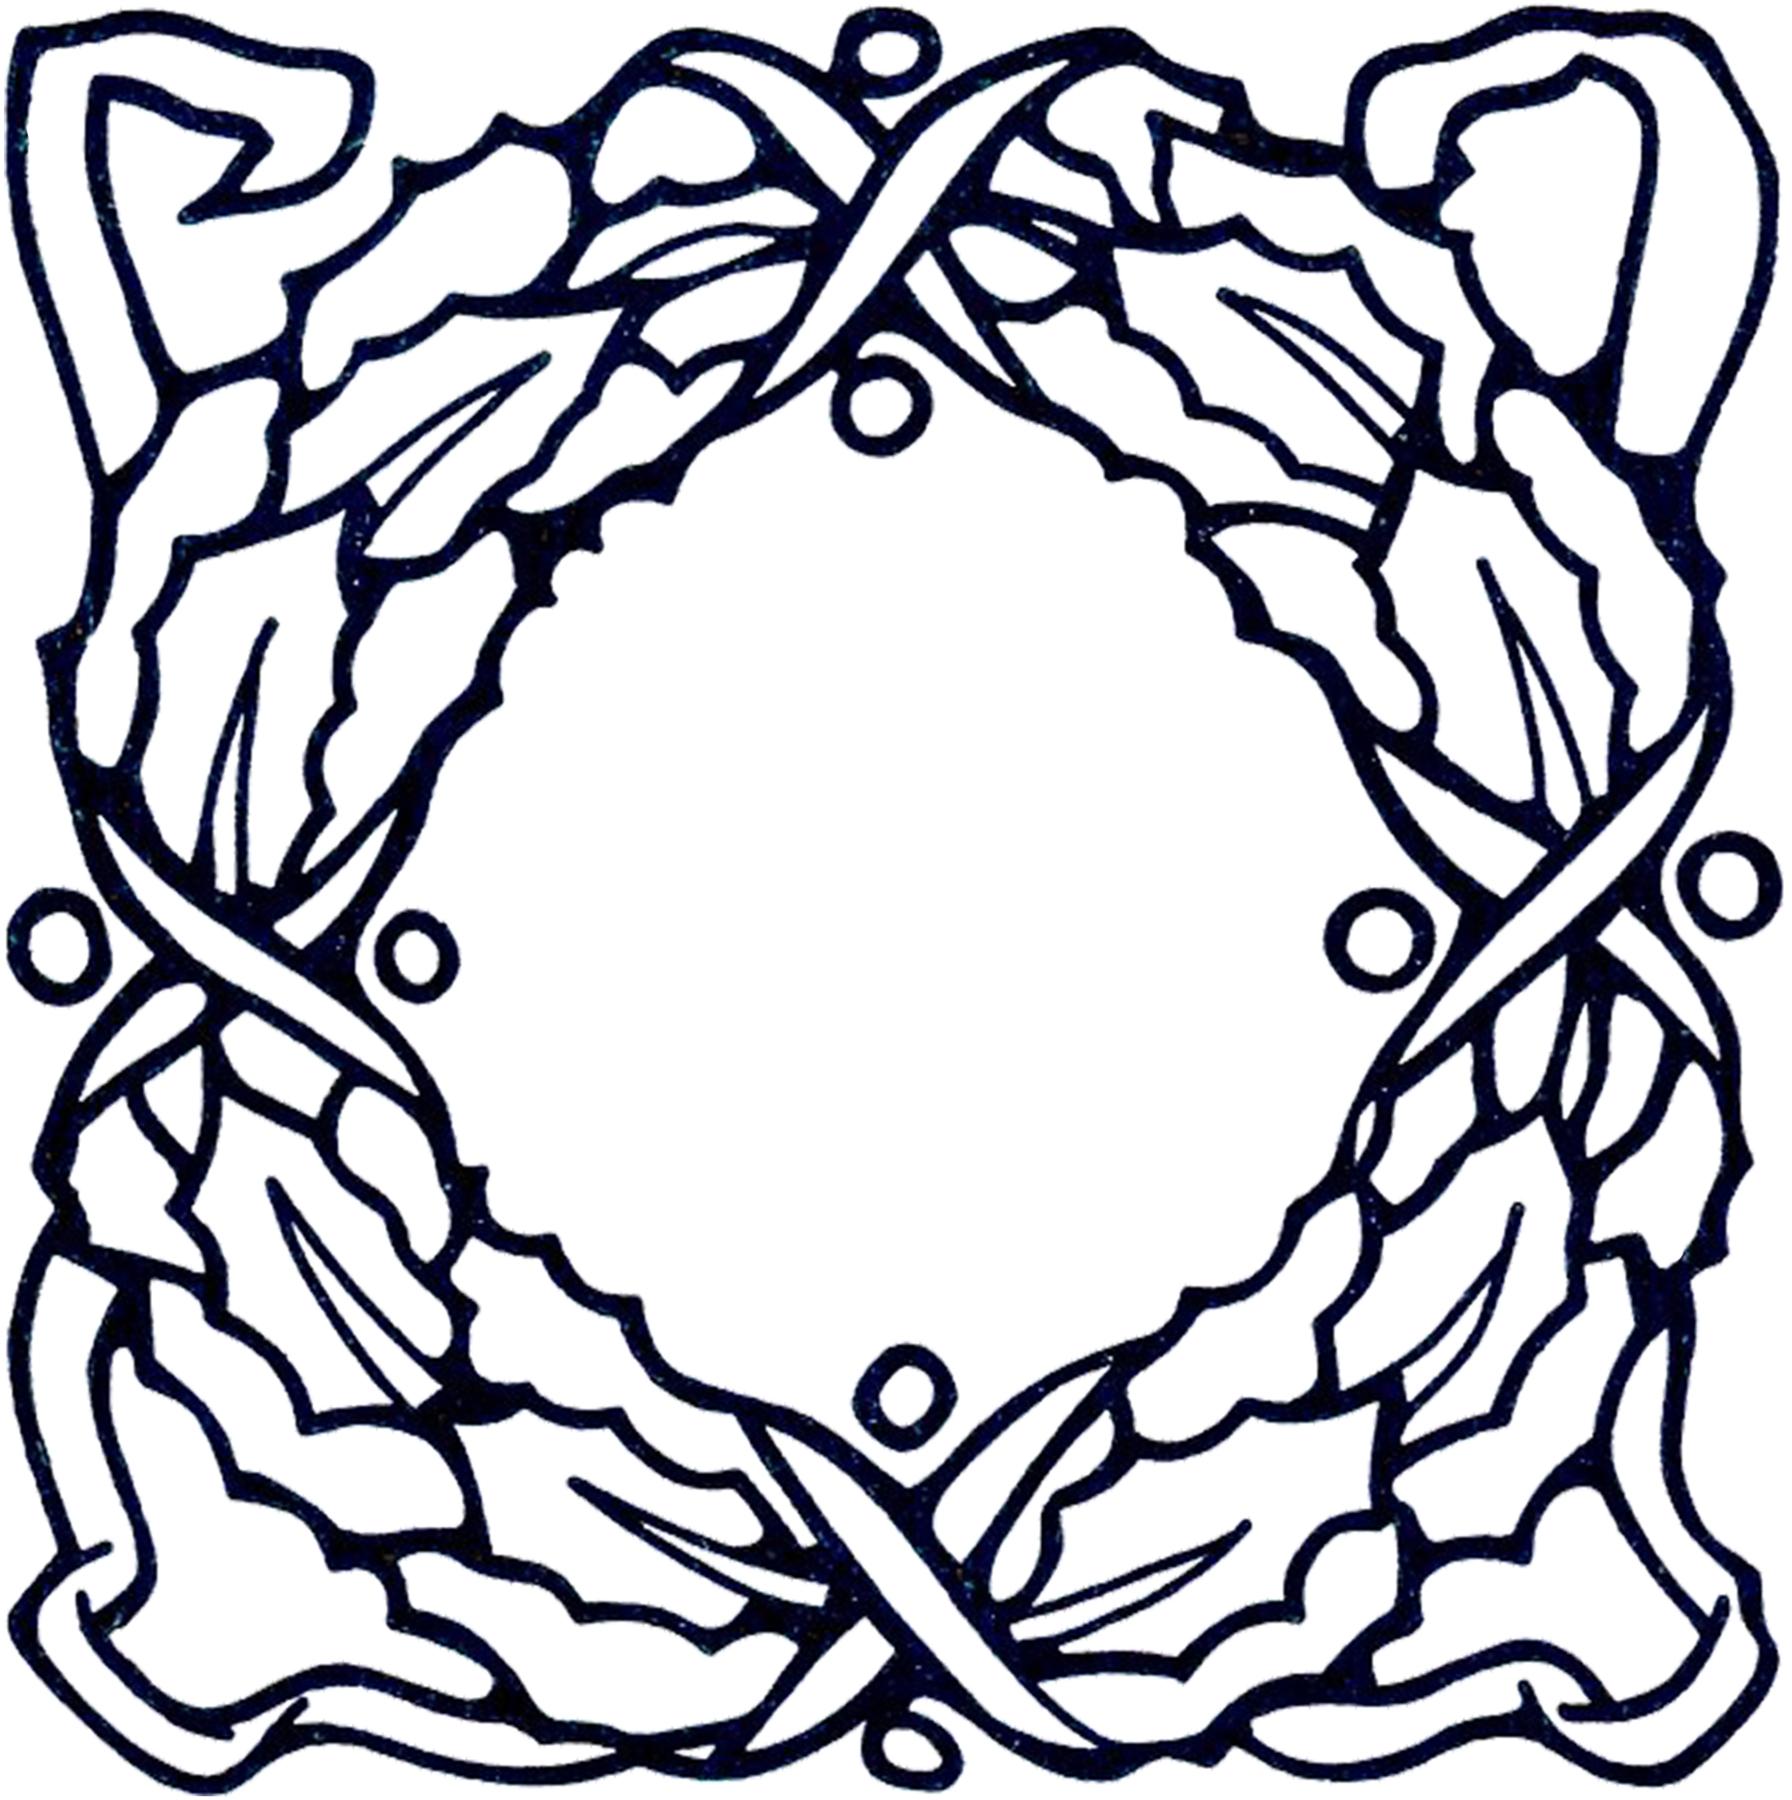 Vintage Christmas Wreath Clip Art - The Graphics Fairy